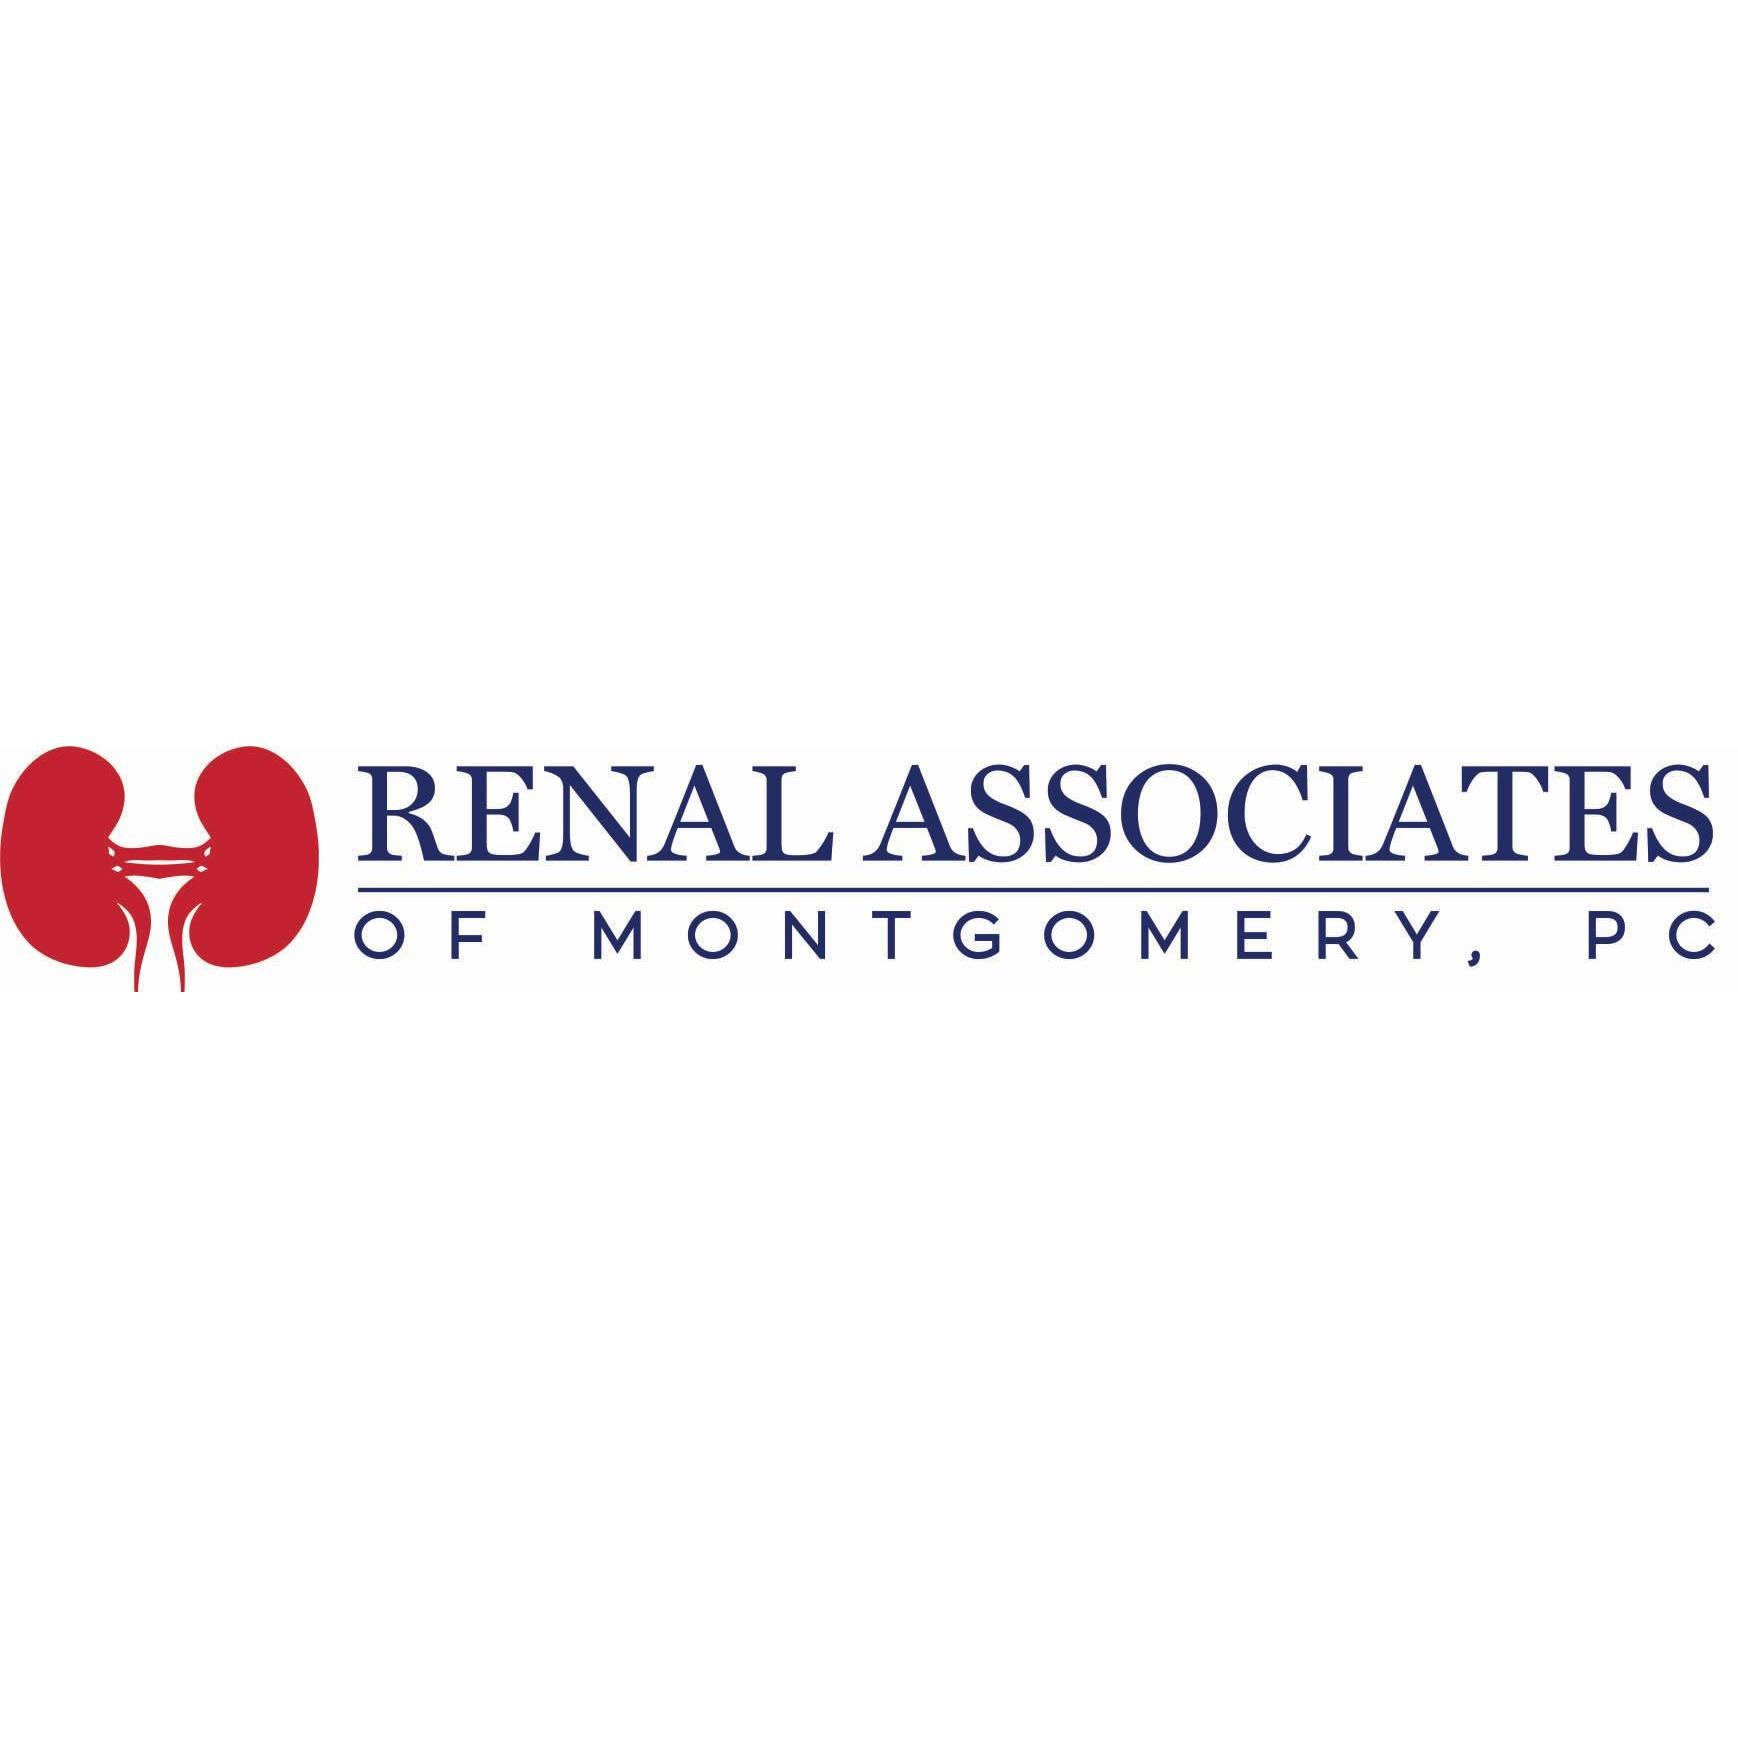 Renal Associates Of Montgomery, Pc